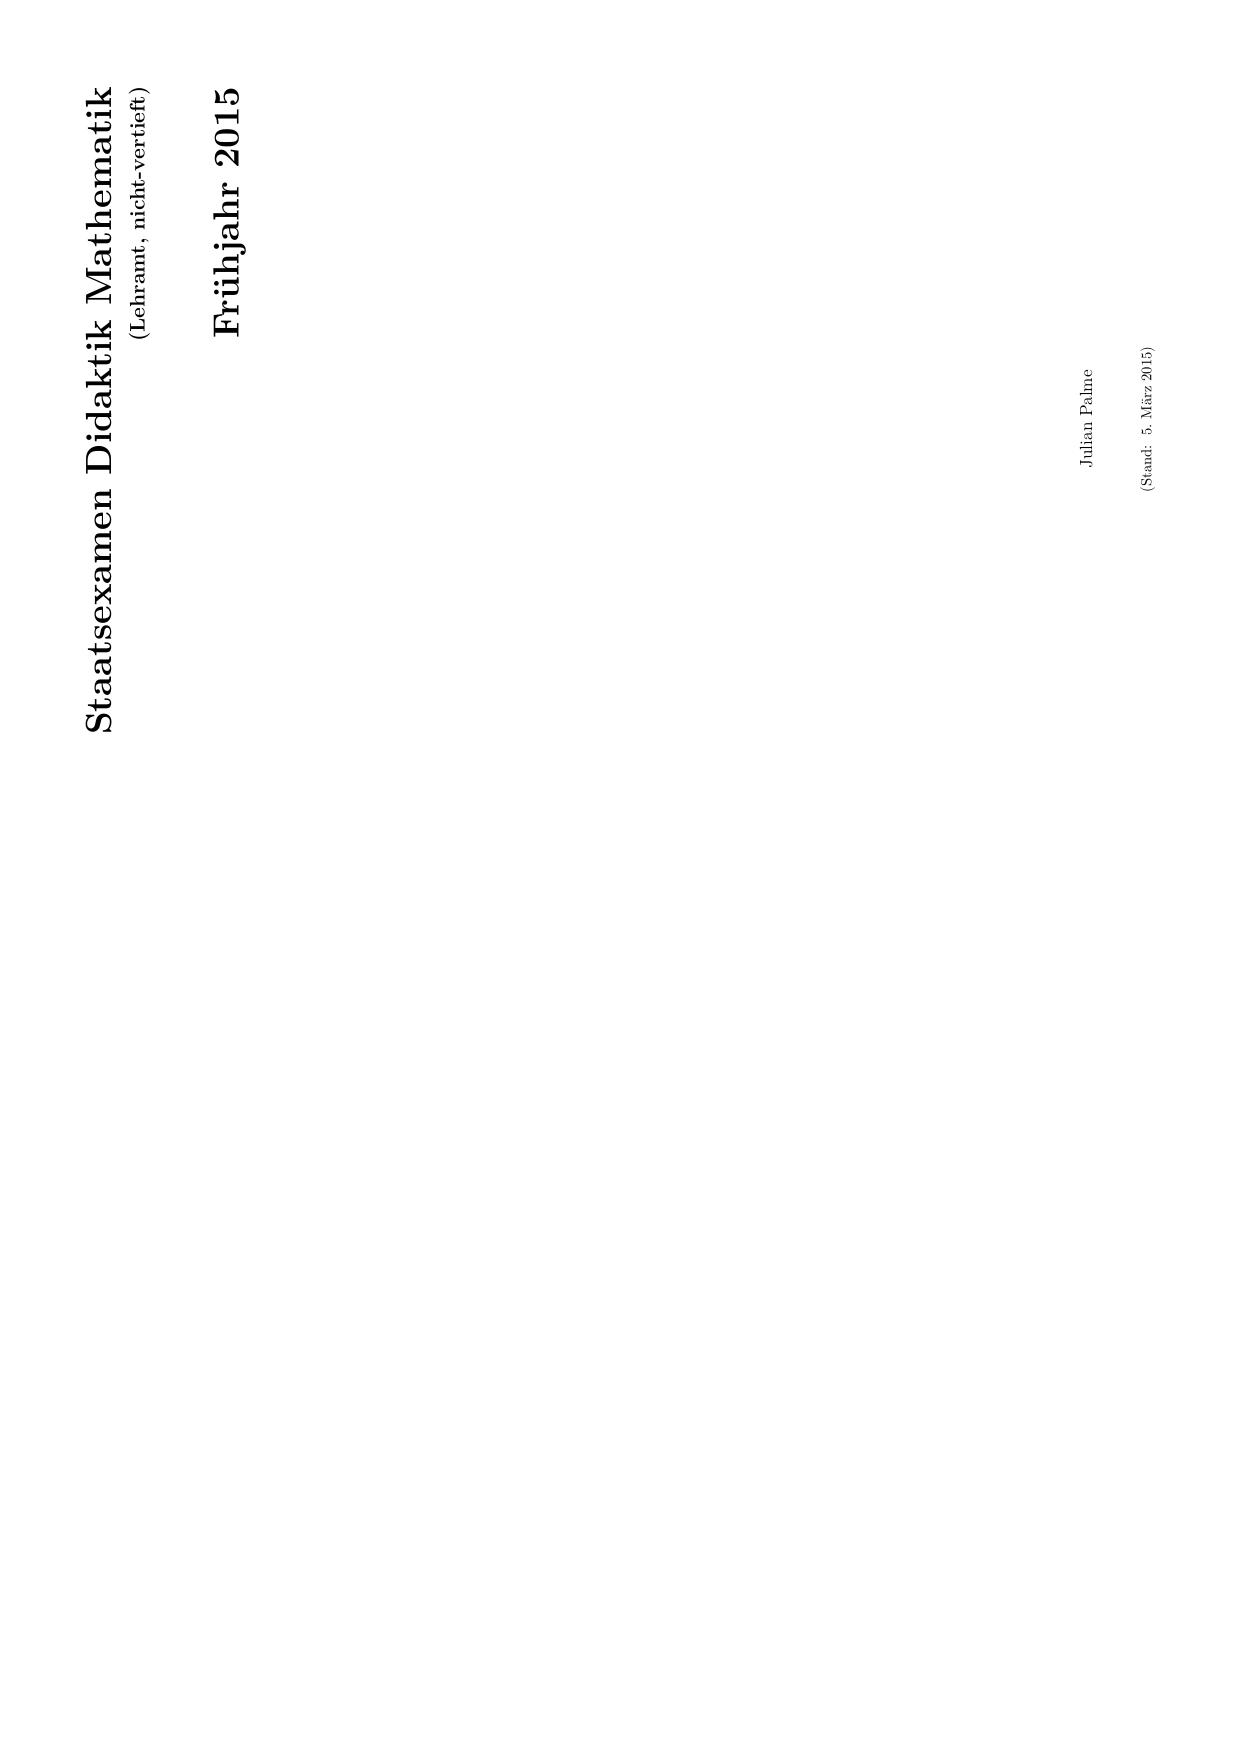 Staatsexamen Didaktik Mathematik F rühjahr 2015